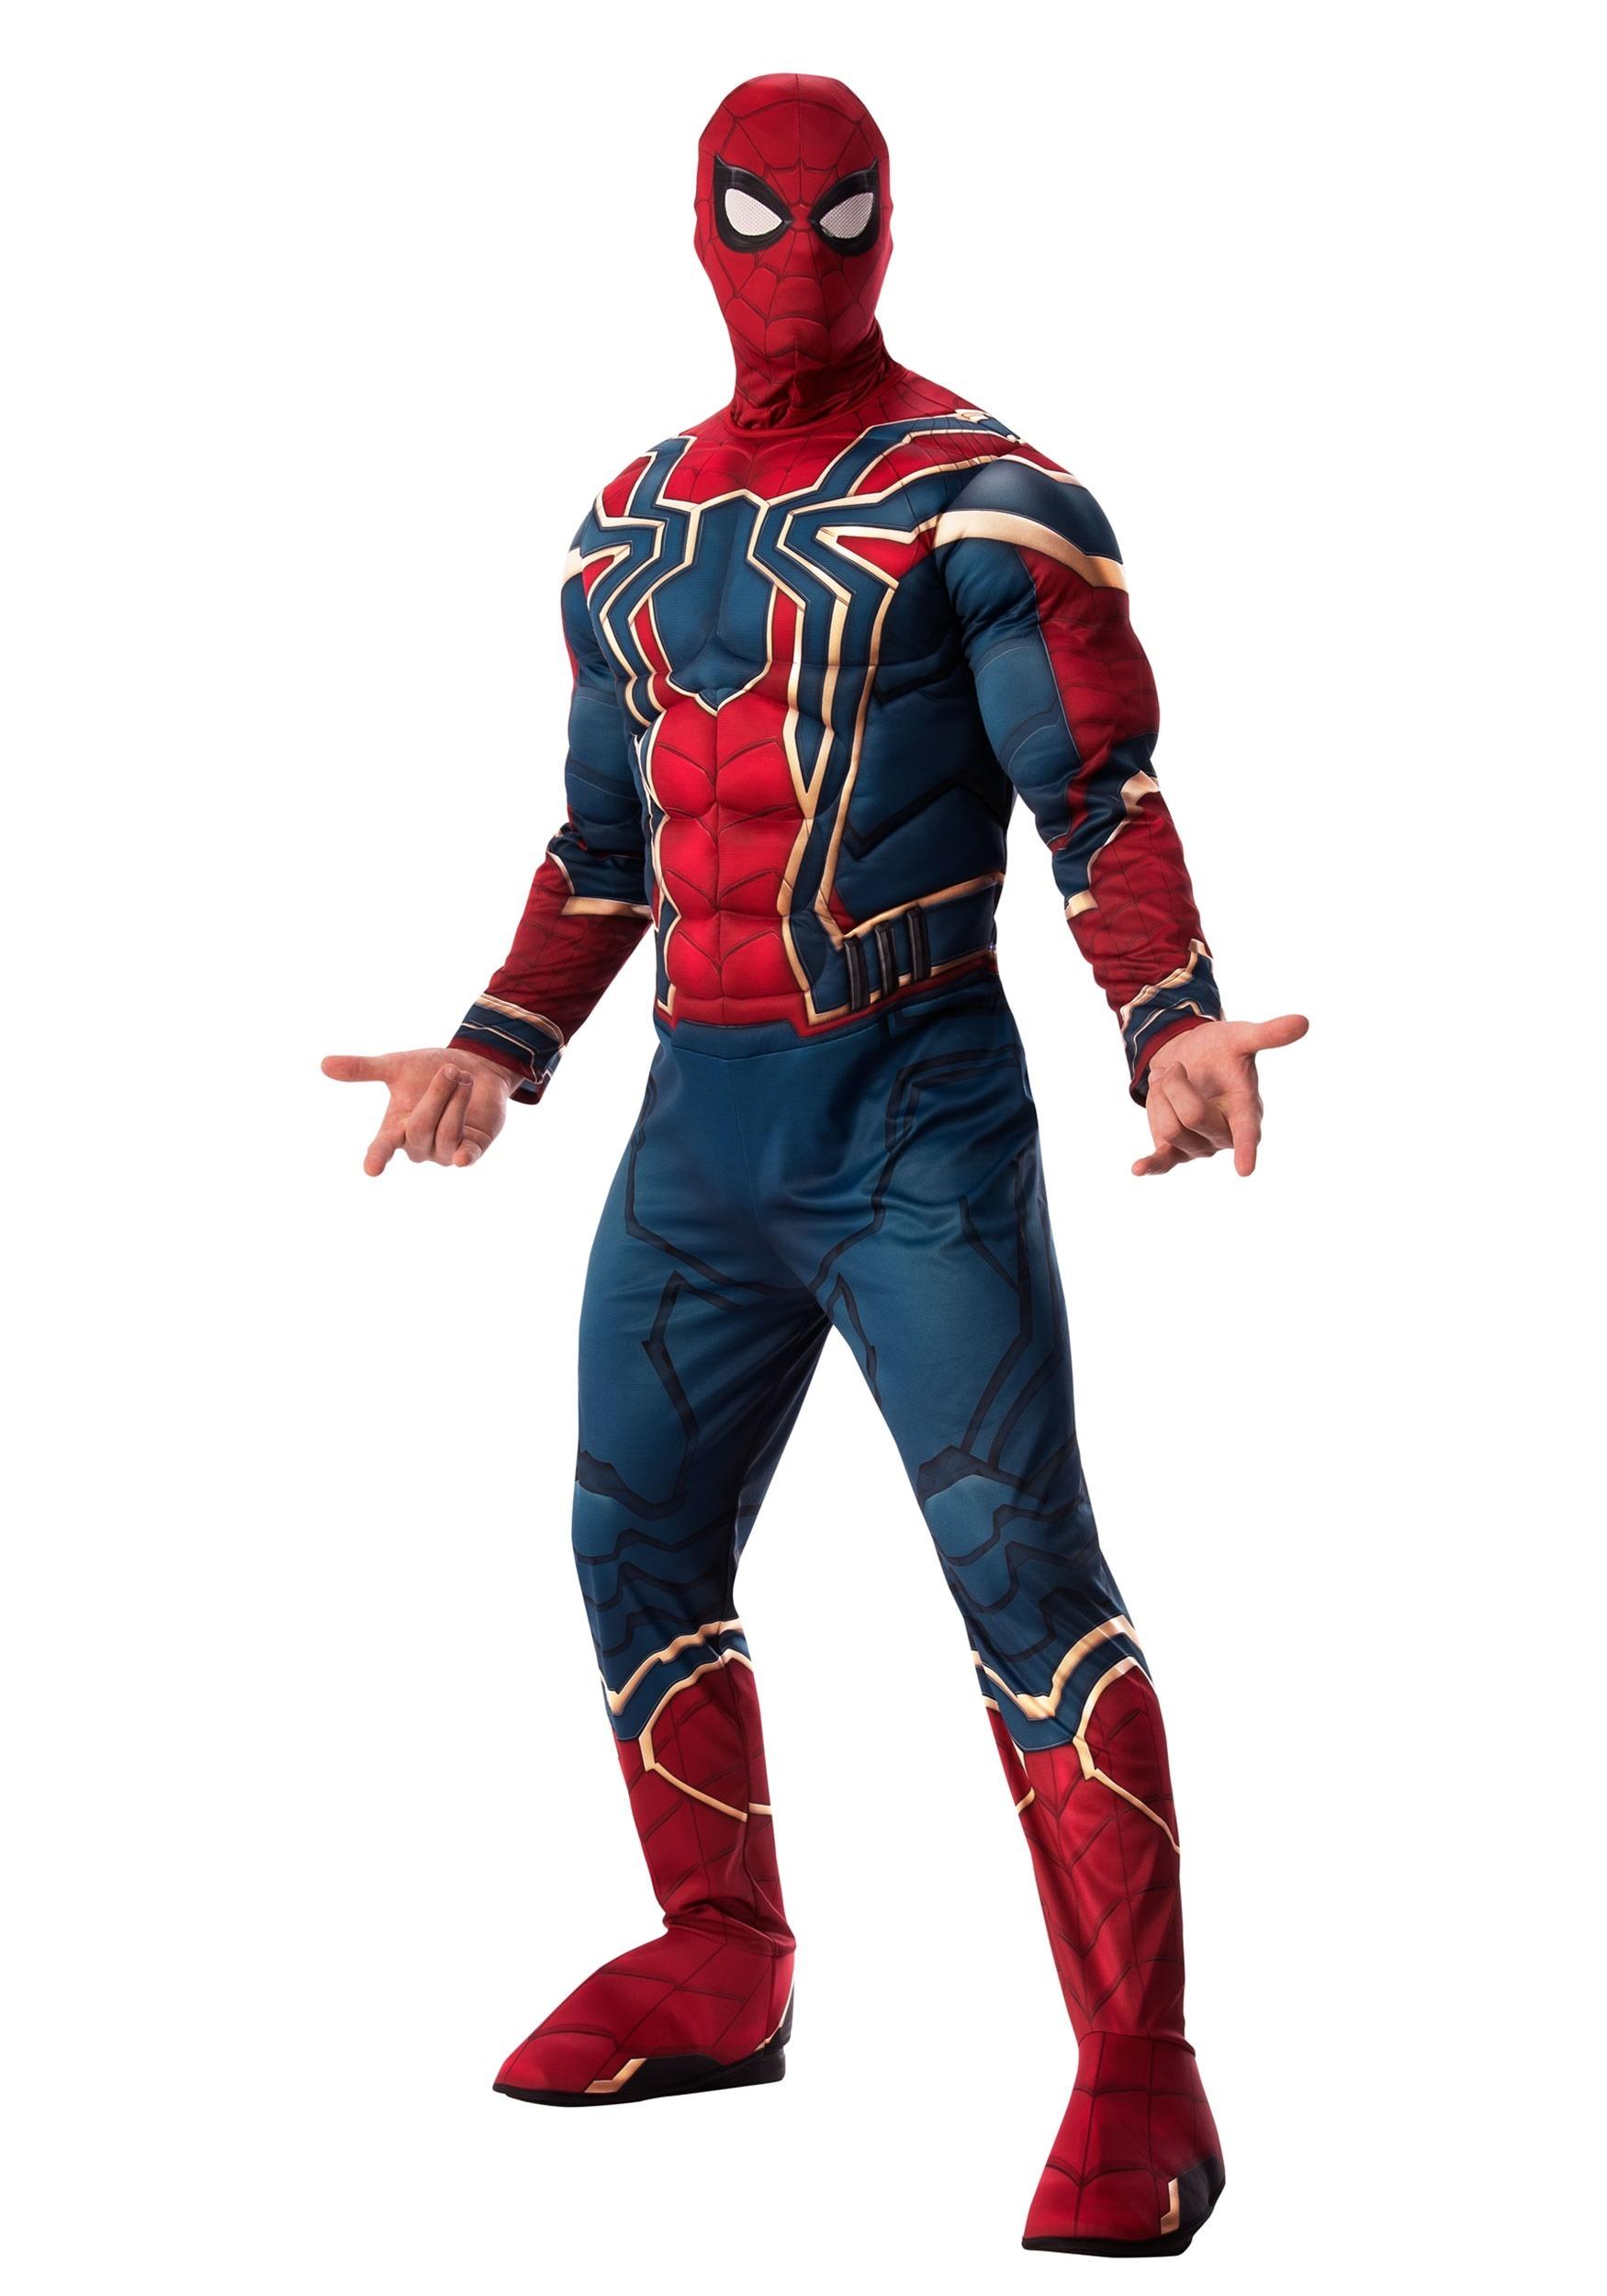 8ec9244a4ba0 Adult Marvel Infinity War Deluxe Iron Spider Costume